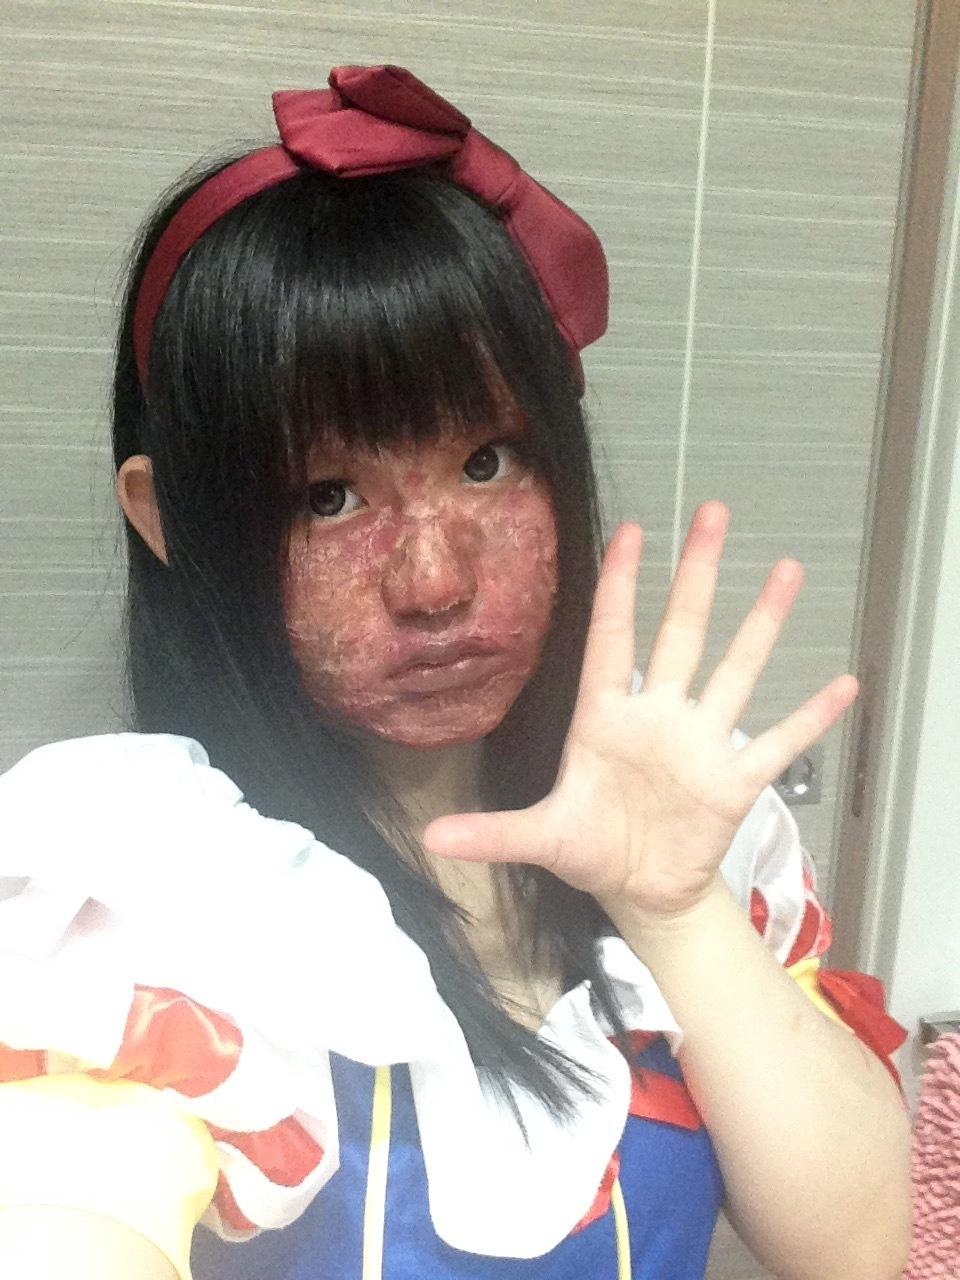 HoneyHoney秋葉原店ブログ          おはまりん(っ'マ'c)【Ver.2.0】